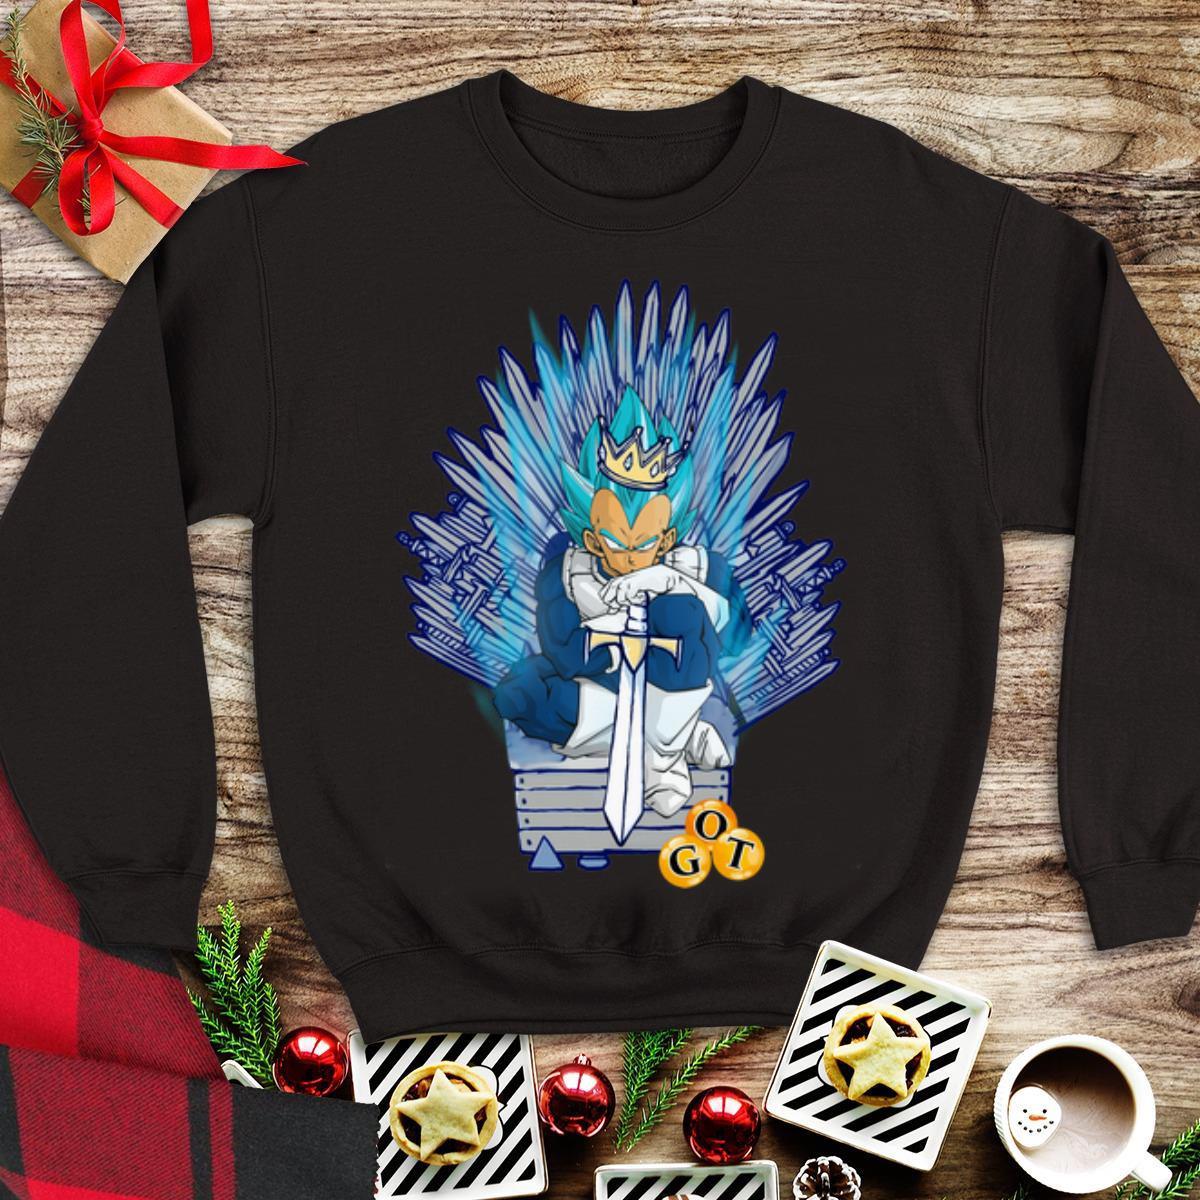 Awesome Game Of Thrones Vegeta GOT shirt